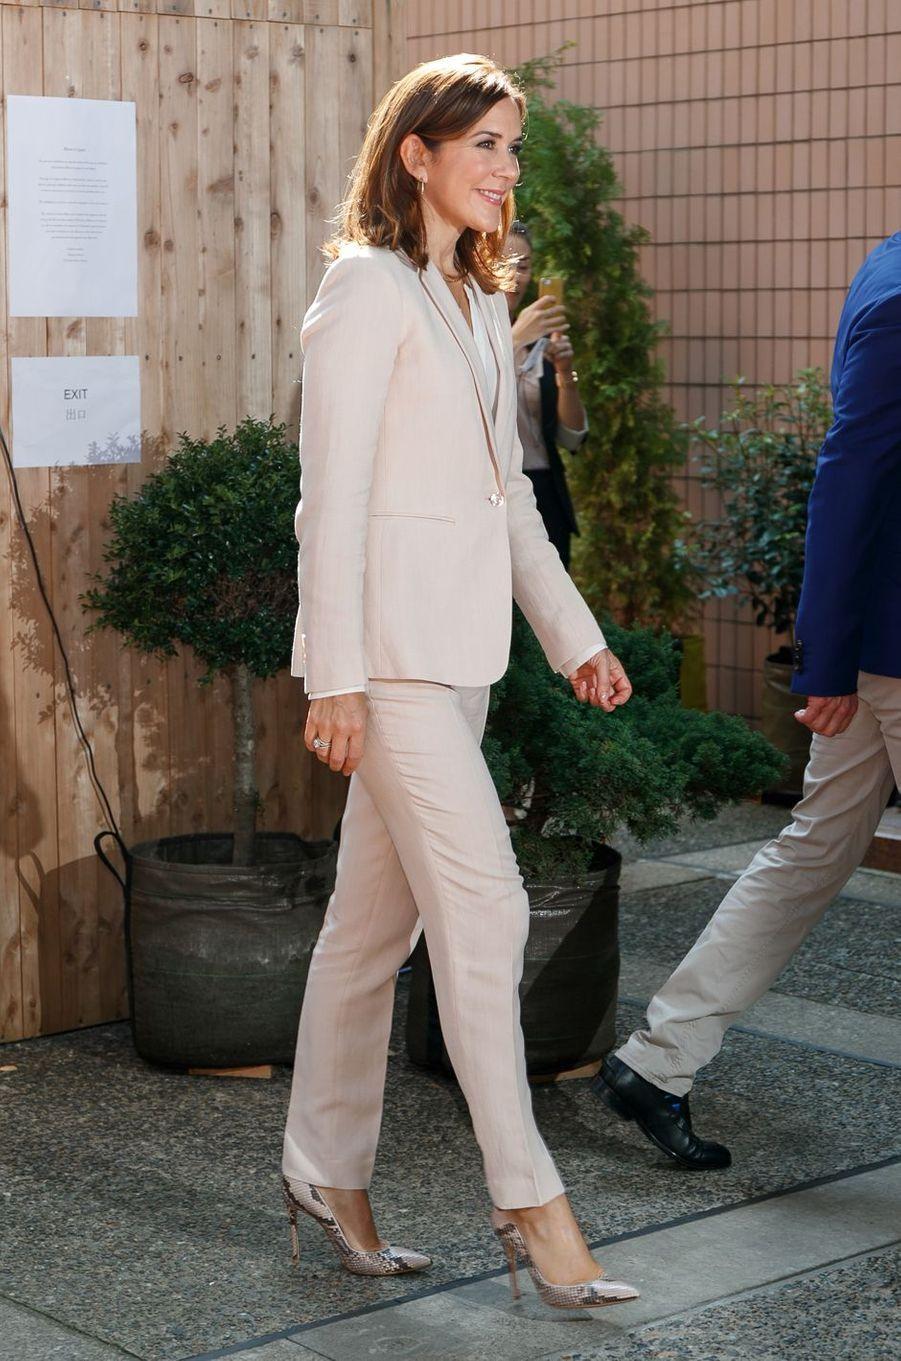 La princesse Mary de Danemark à Tokyo, le 12 octobre 2017